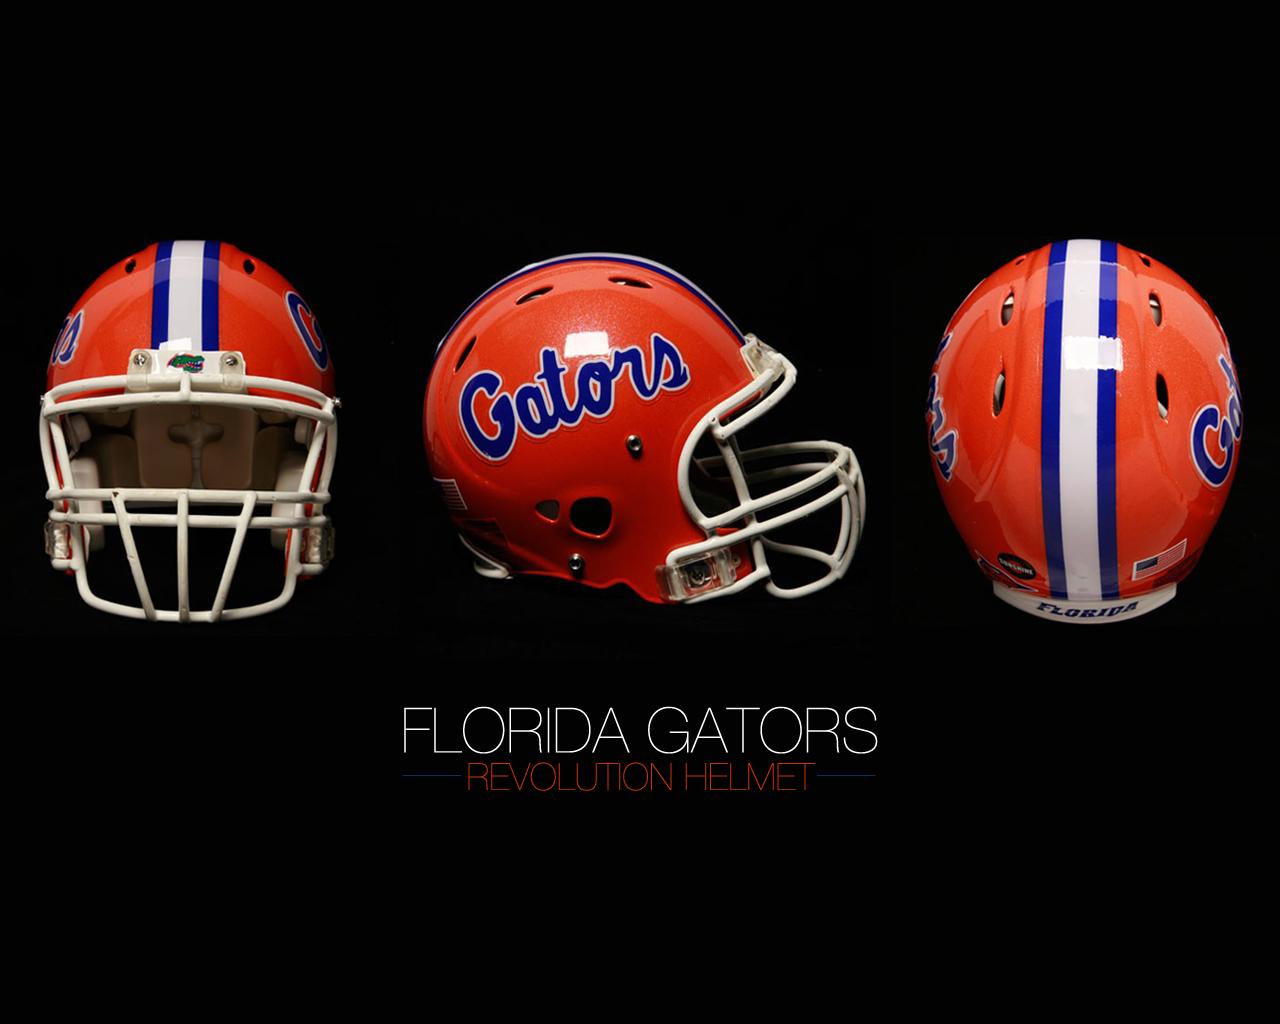 Florida Gators Football Wallpaper Collection Sports Geekery 1280x1024